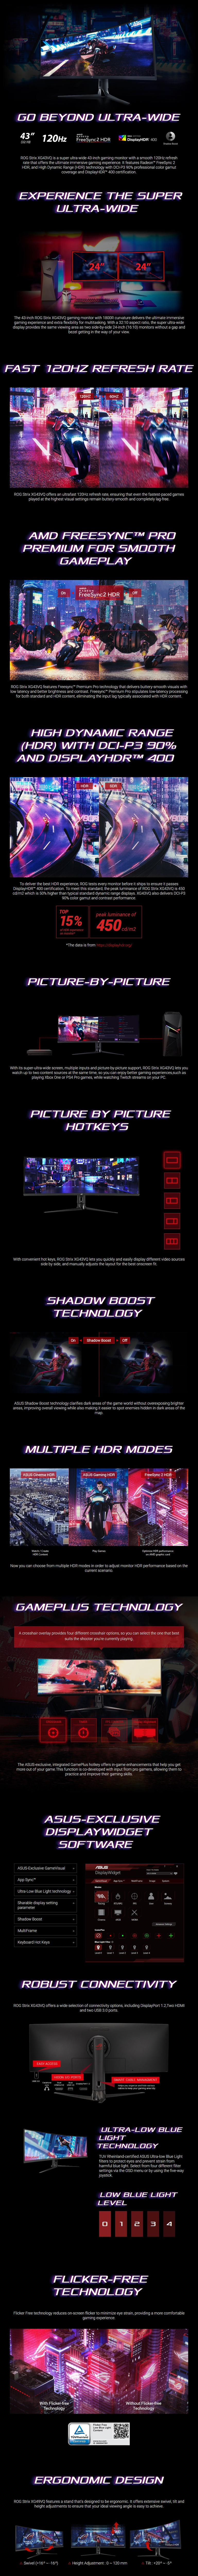 asus-rog-strix-xg43vq-43-super-ultrawide-120hz-freesync-curved-gaming-monitor-ac34182-10.jpg